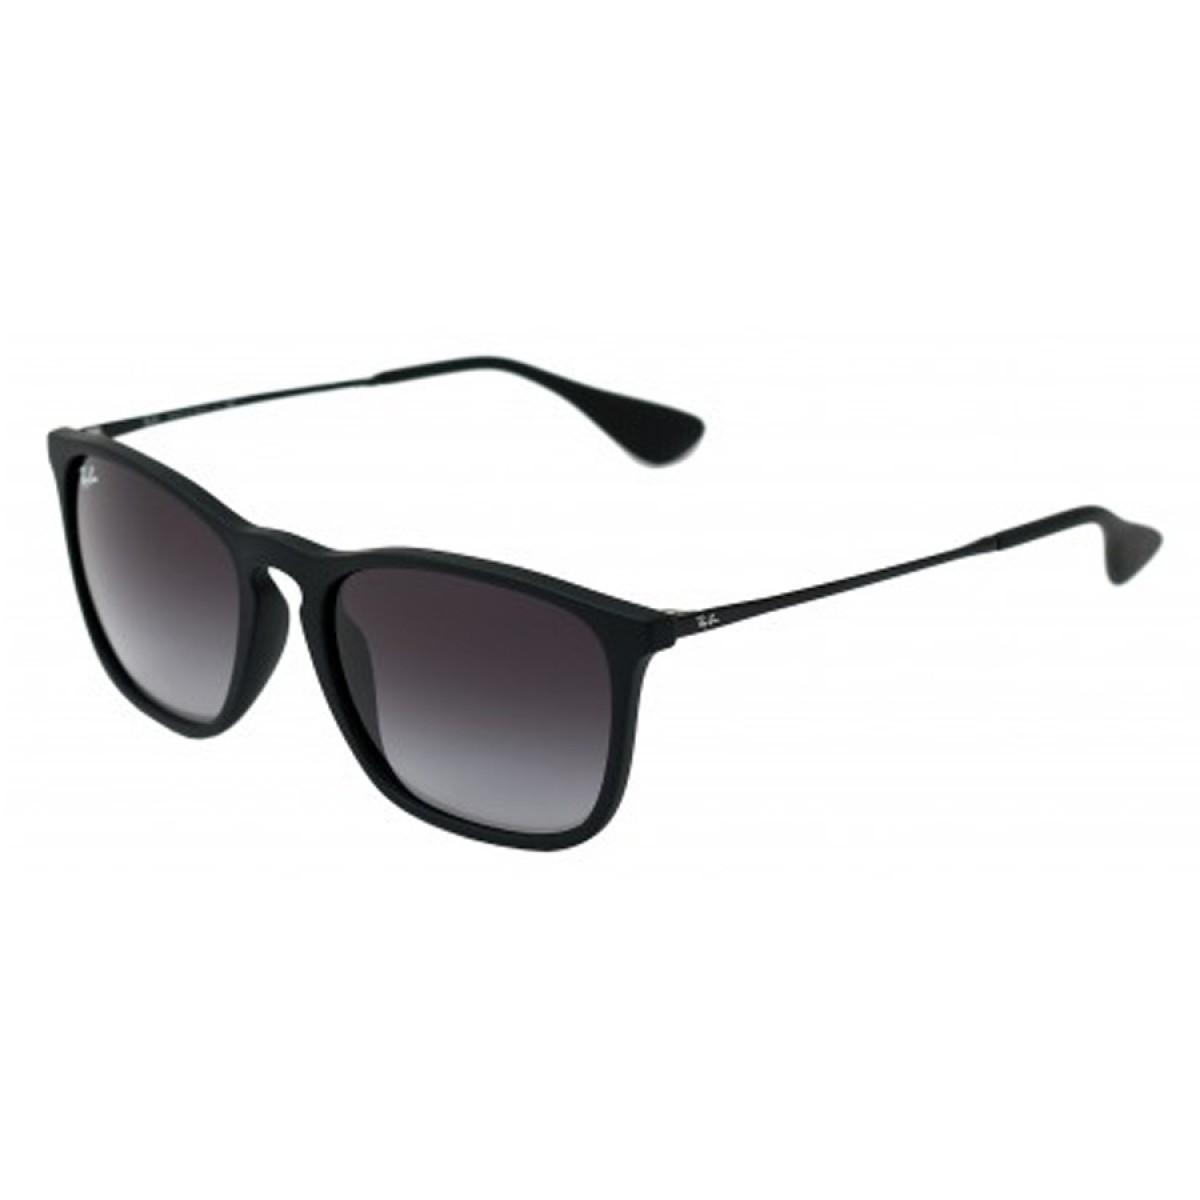 64b53383e4 Ray Ban Chris Unisex Sunglasses RB4187-622 8G - Sunglasses - Fashion World